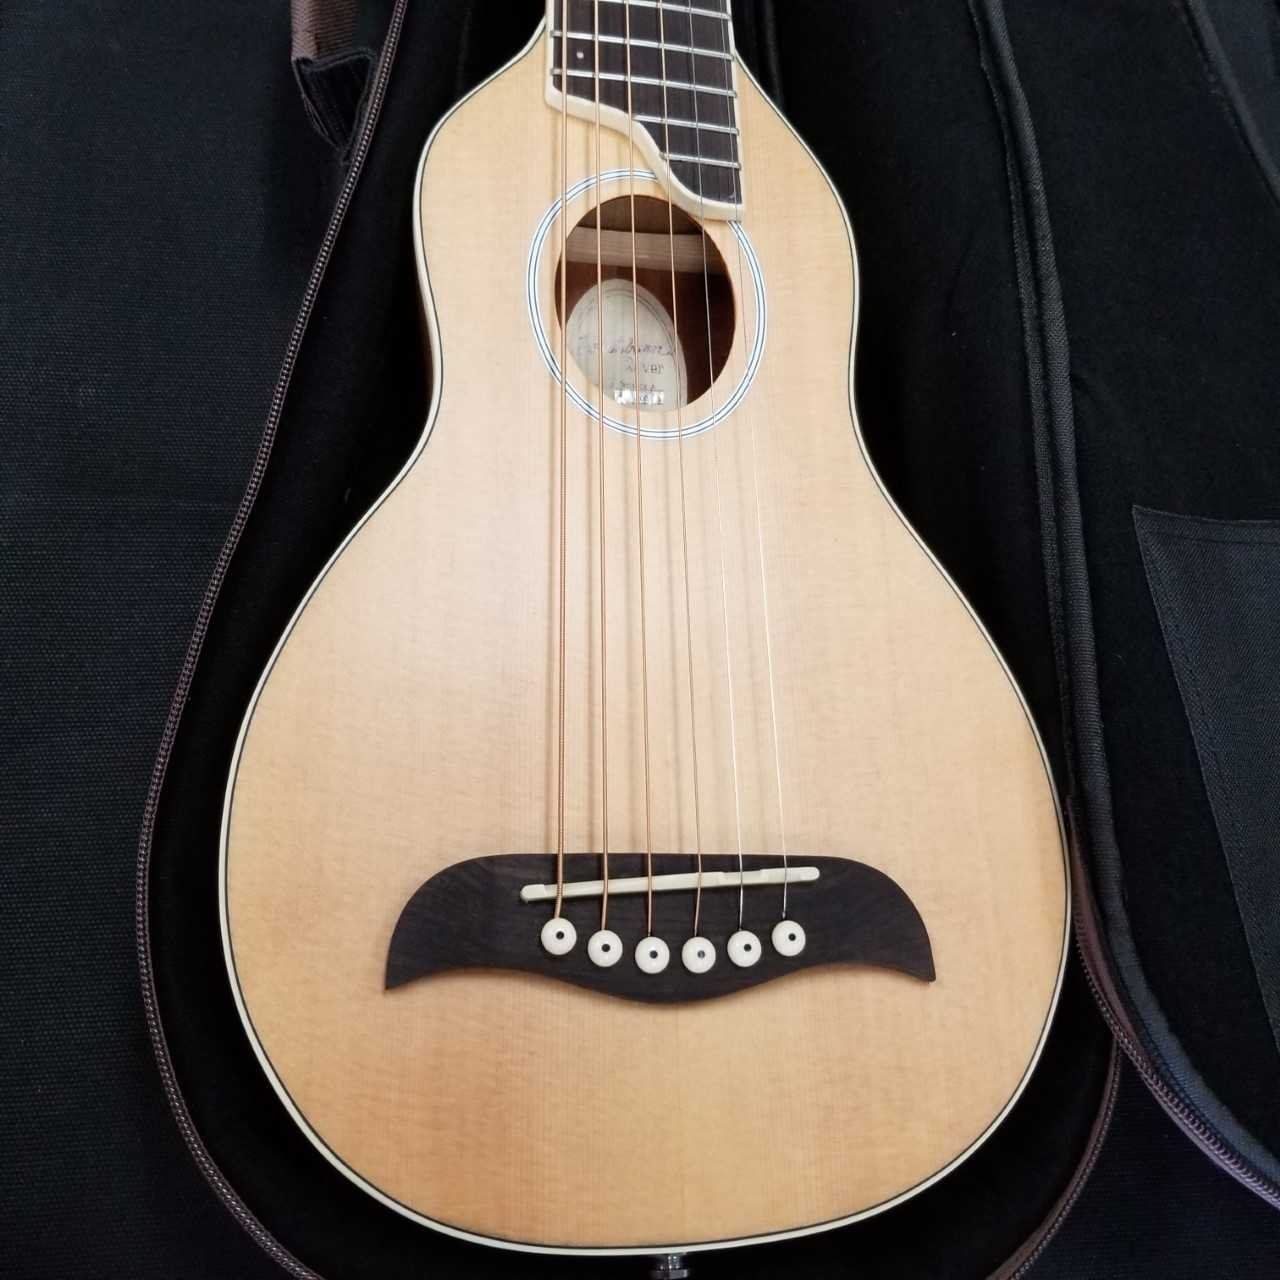 Washburn Rover Travel Acoustic Guitar w/ Bag